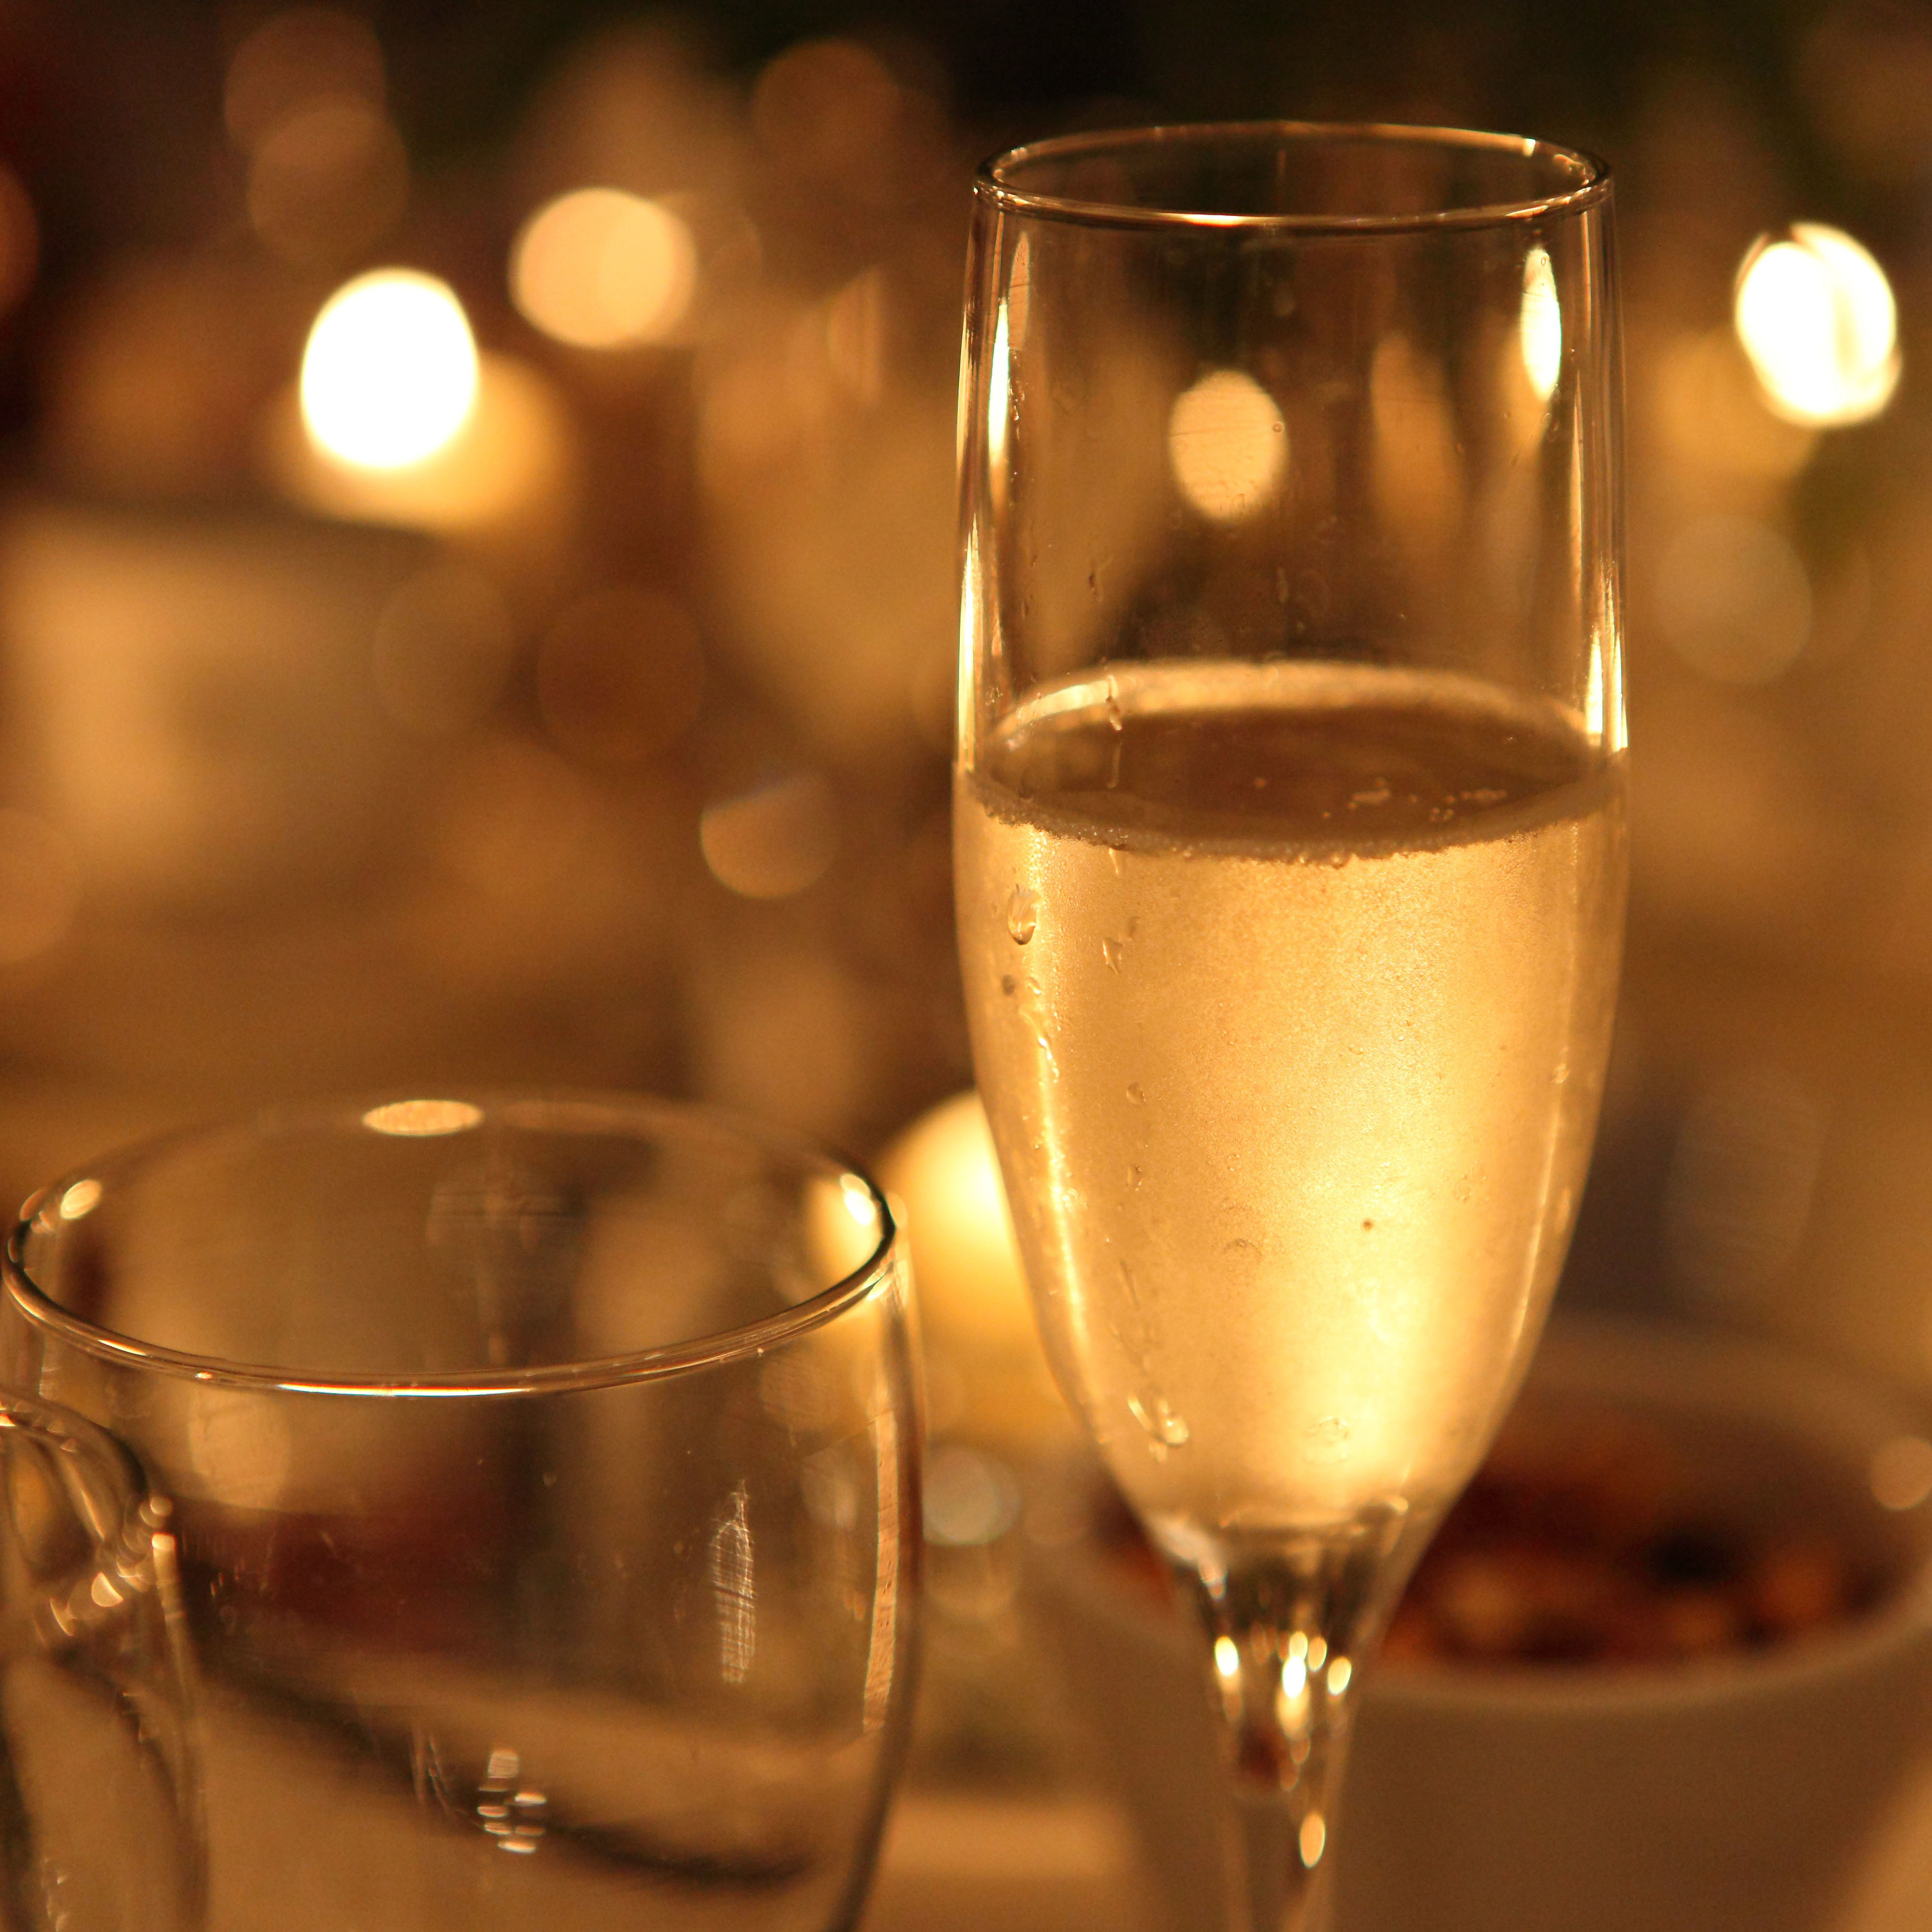 Champagne ghlhb3